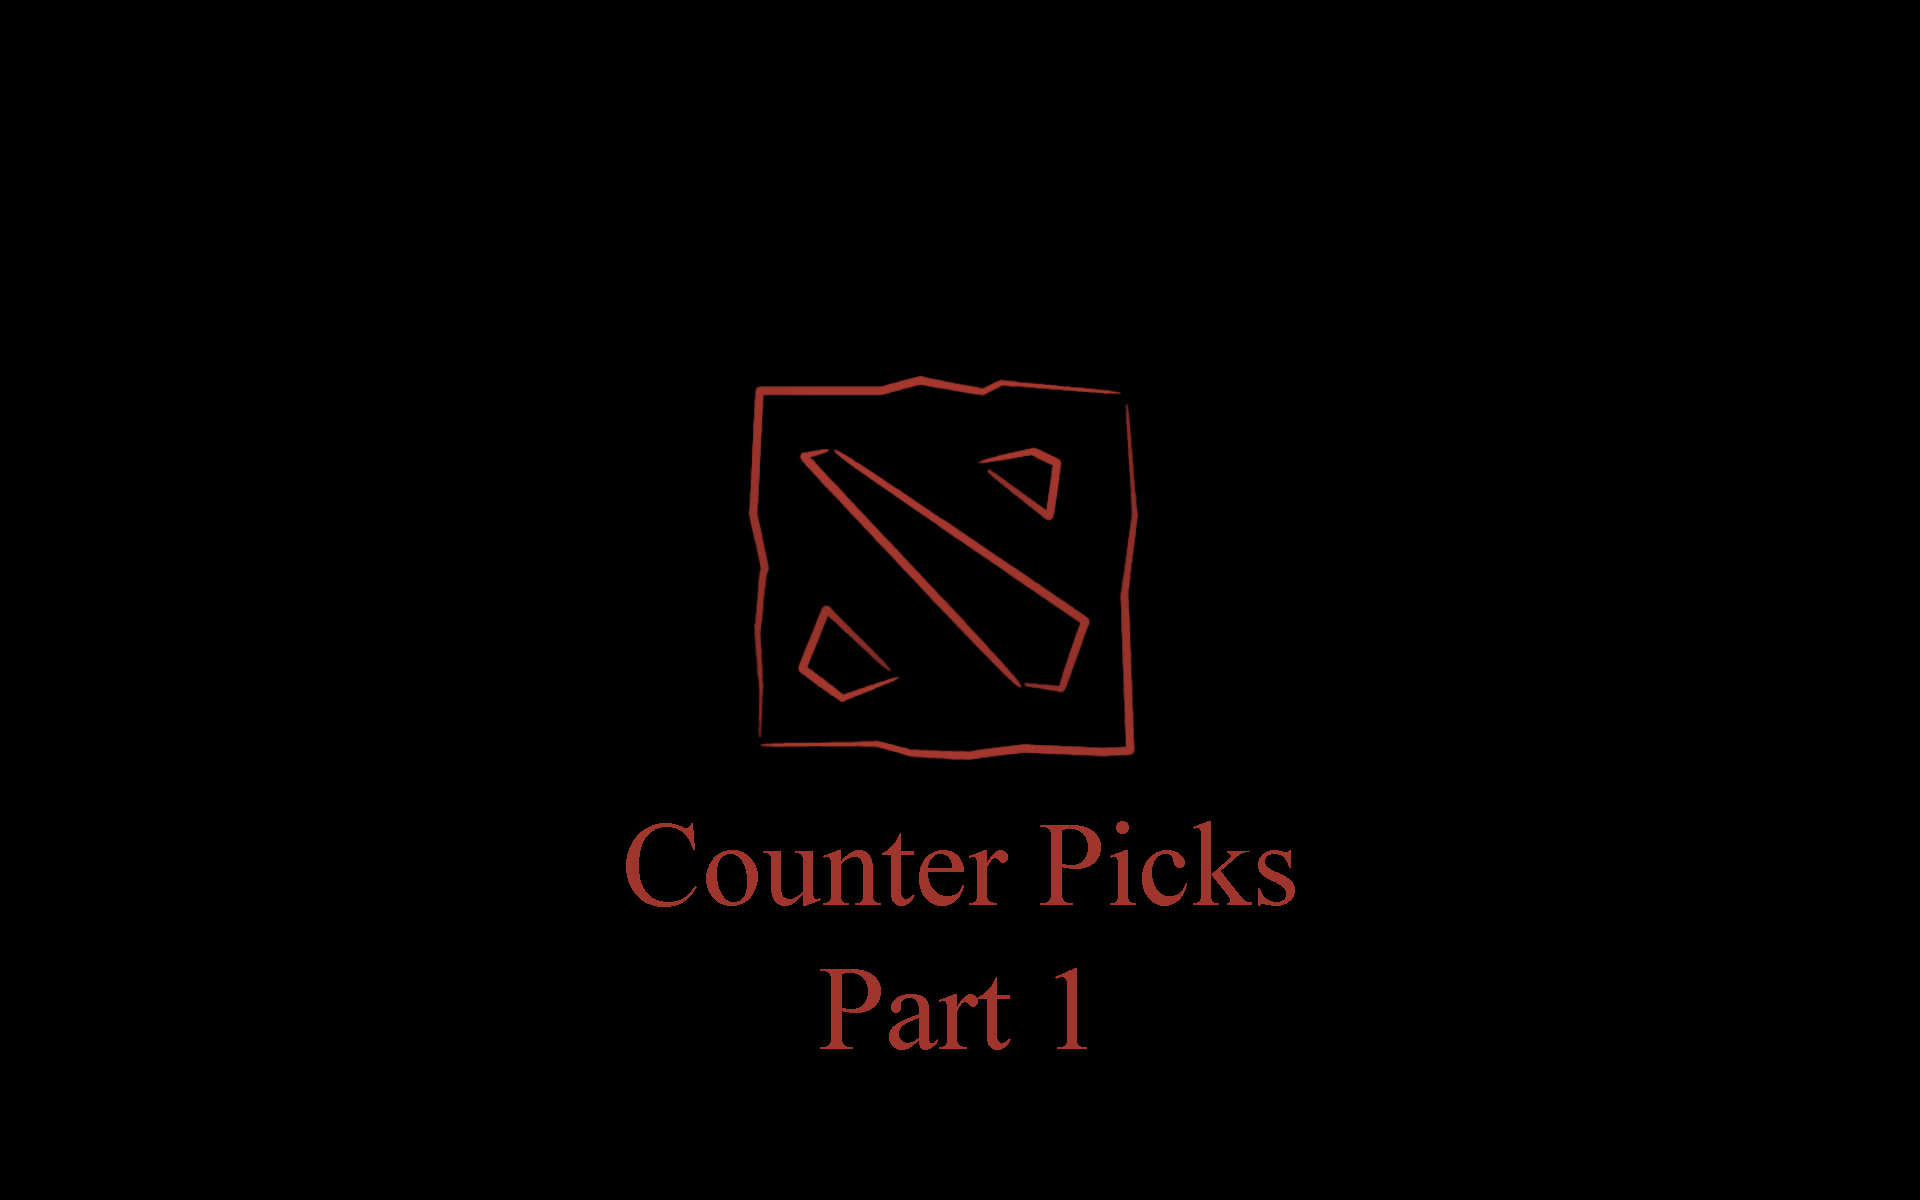 Counter Picks Dota 2 How To Counter Picks Dota 2 Detailed Counter Peaks Heroes Dota 2 Part 1 Wewatch Gg